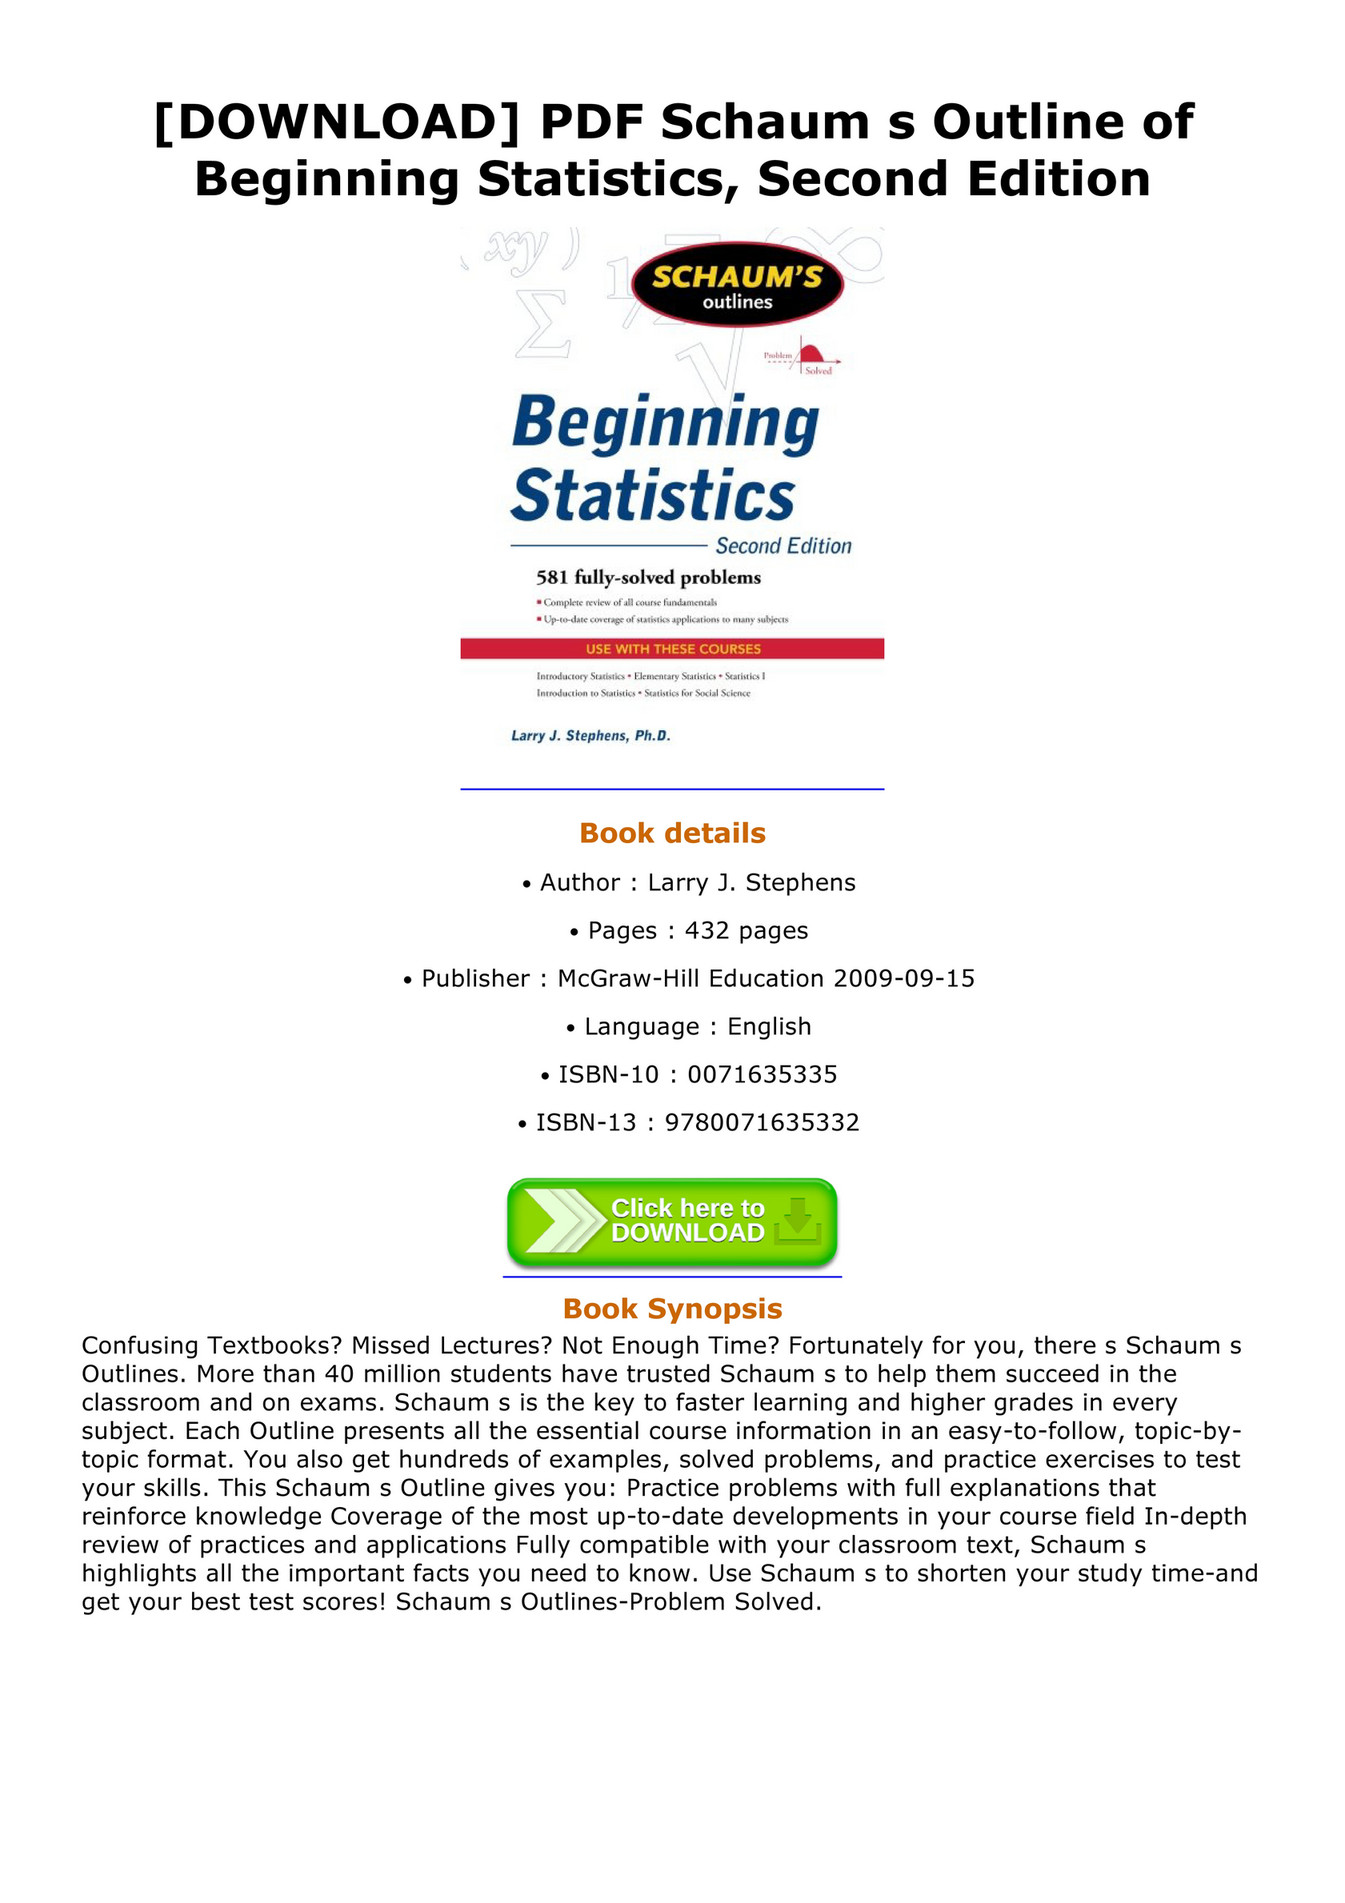 Becker - DOWNLOAD PDF Schaum s Outline of Beginning